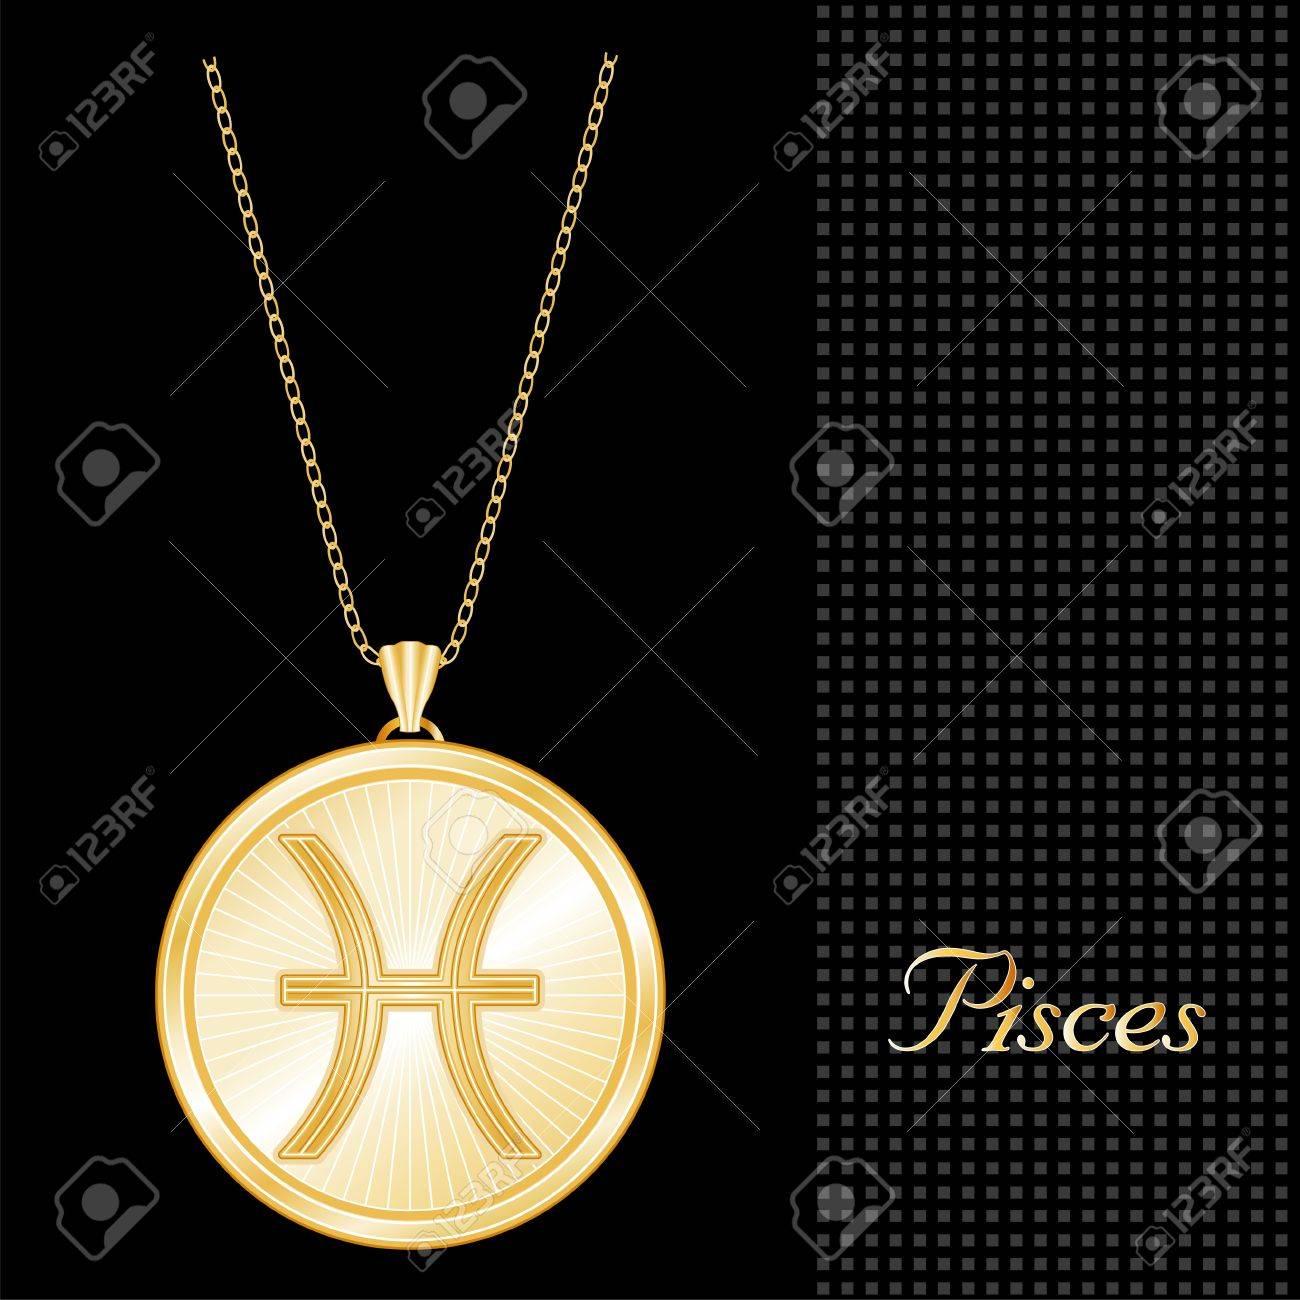 Pisces pendant gold necklace and chain engraved astrology water pisces pendant gold necklace and chain engraved astrology water sign symbol star burst design mozeypictures Choice Image